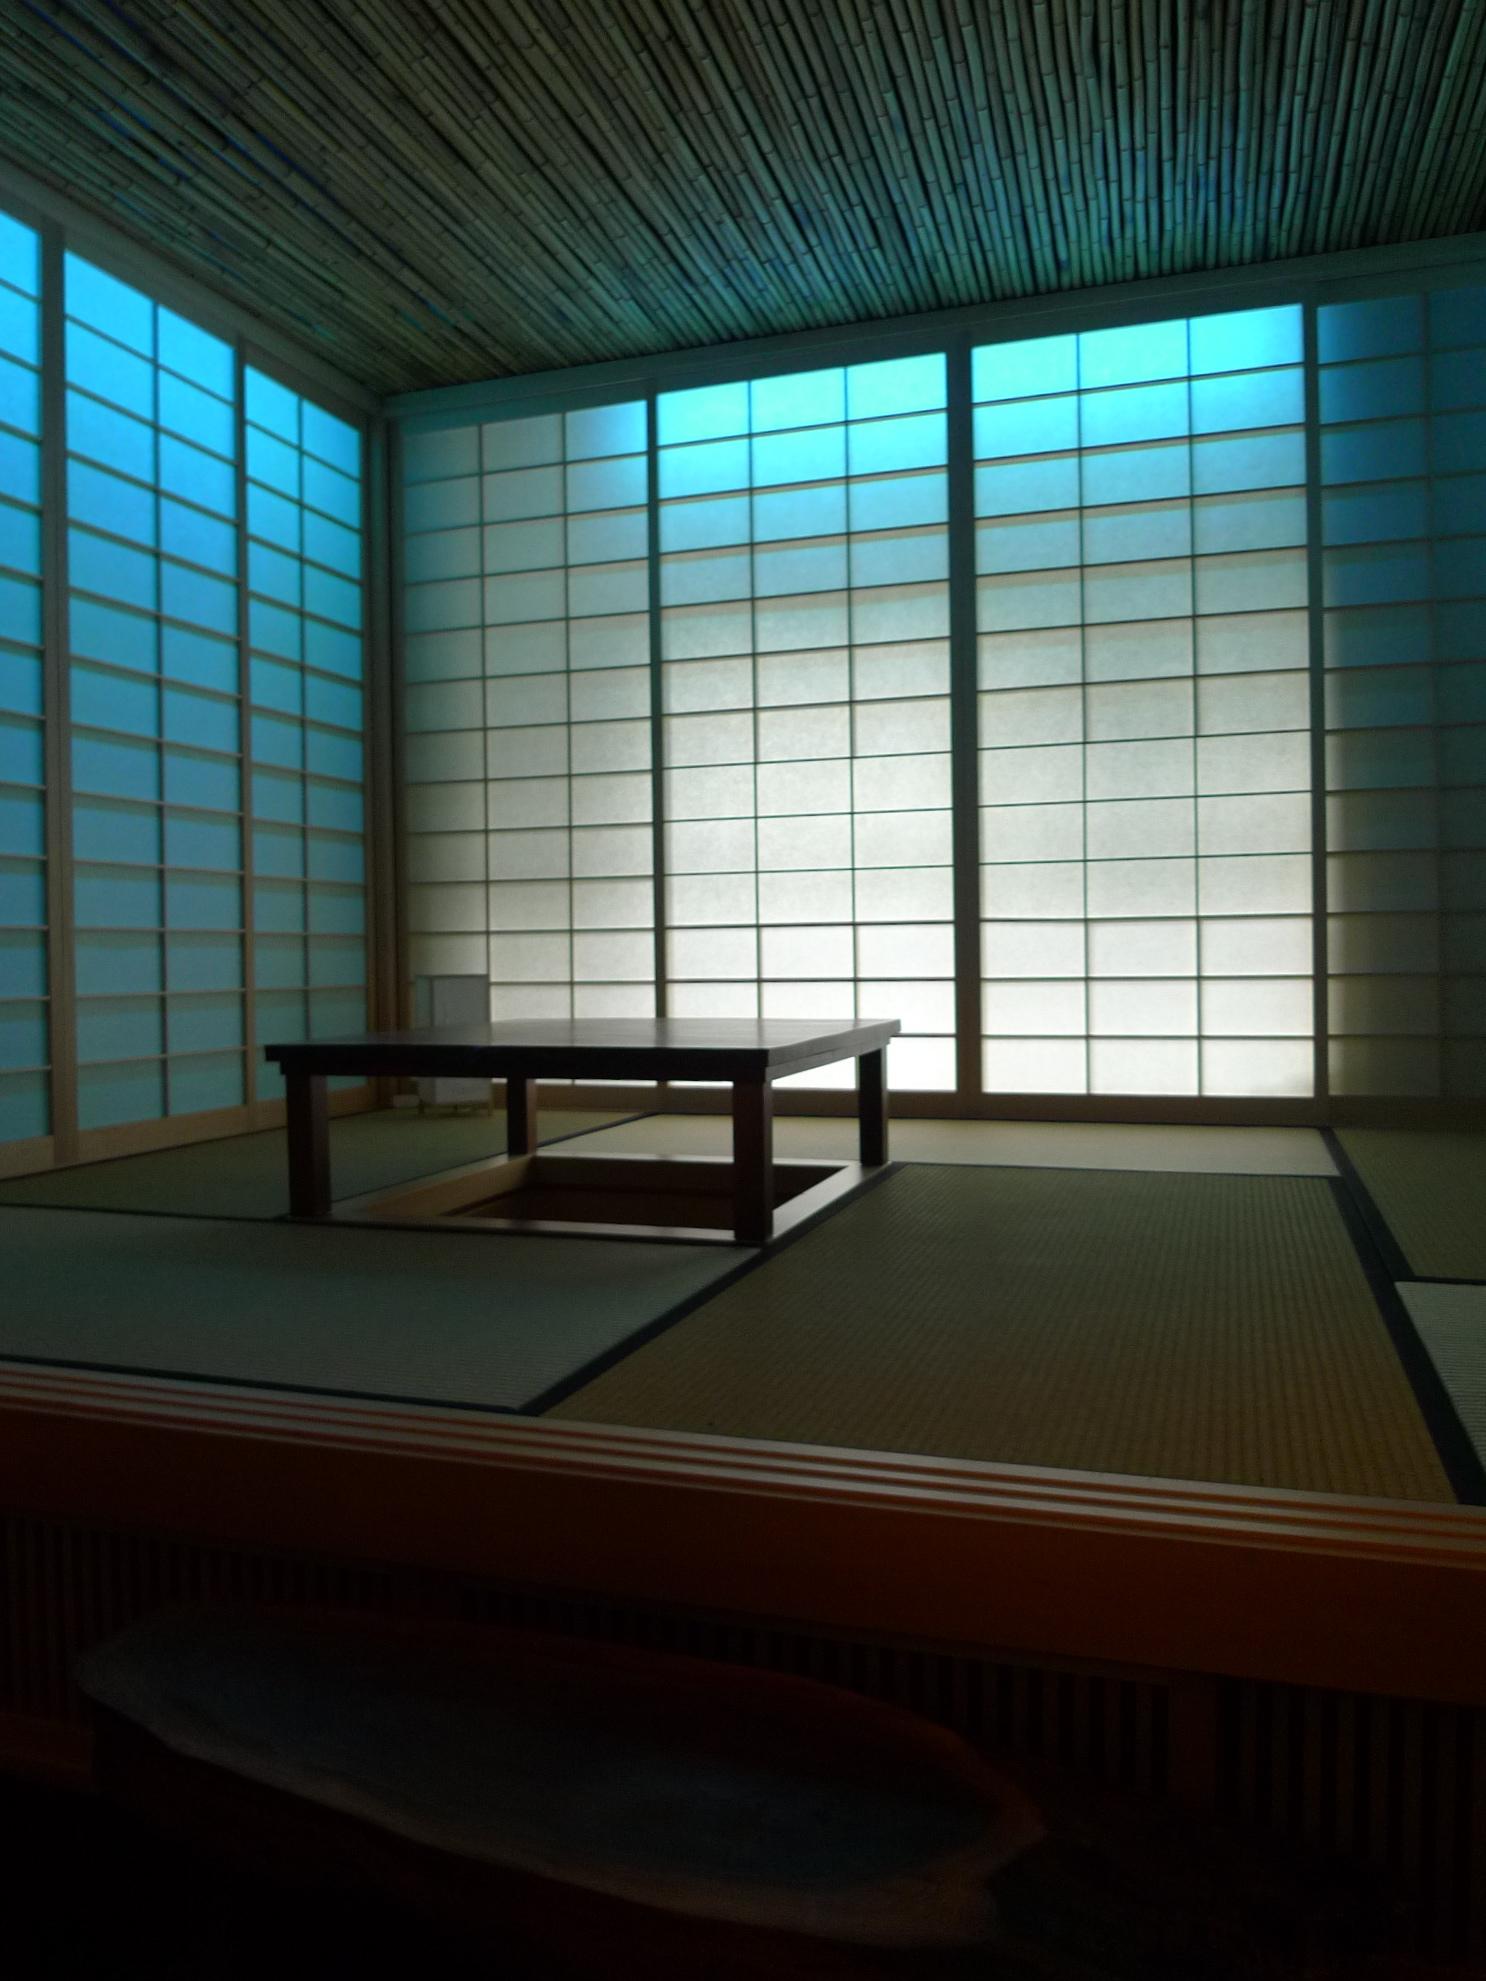 MIYA SHOJI U2013 Japanese Shoji Screen Partition Dividers ...